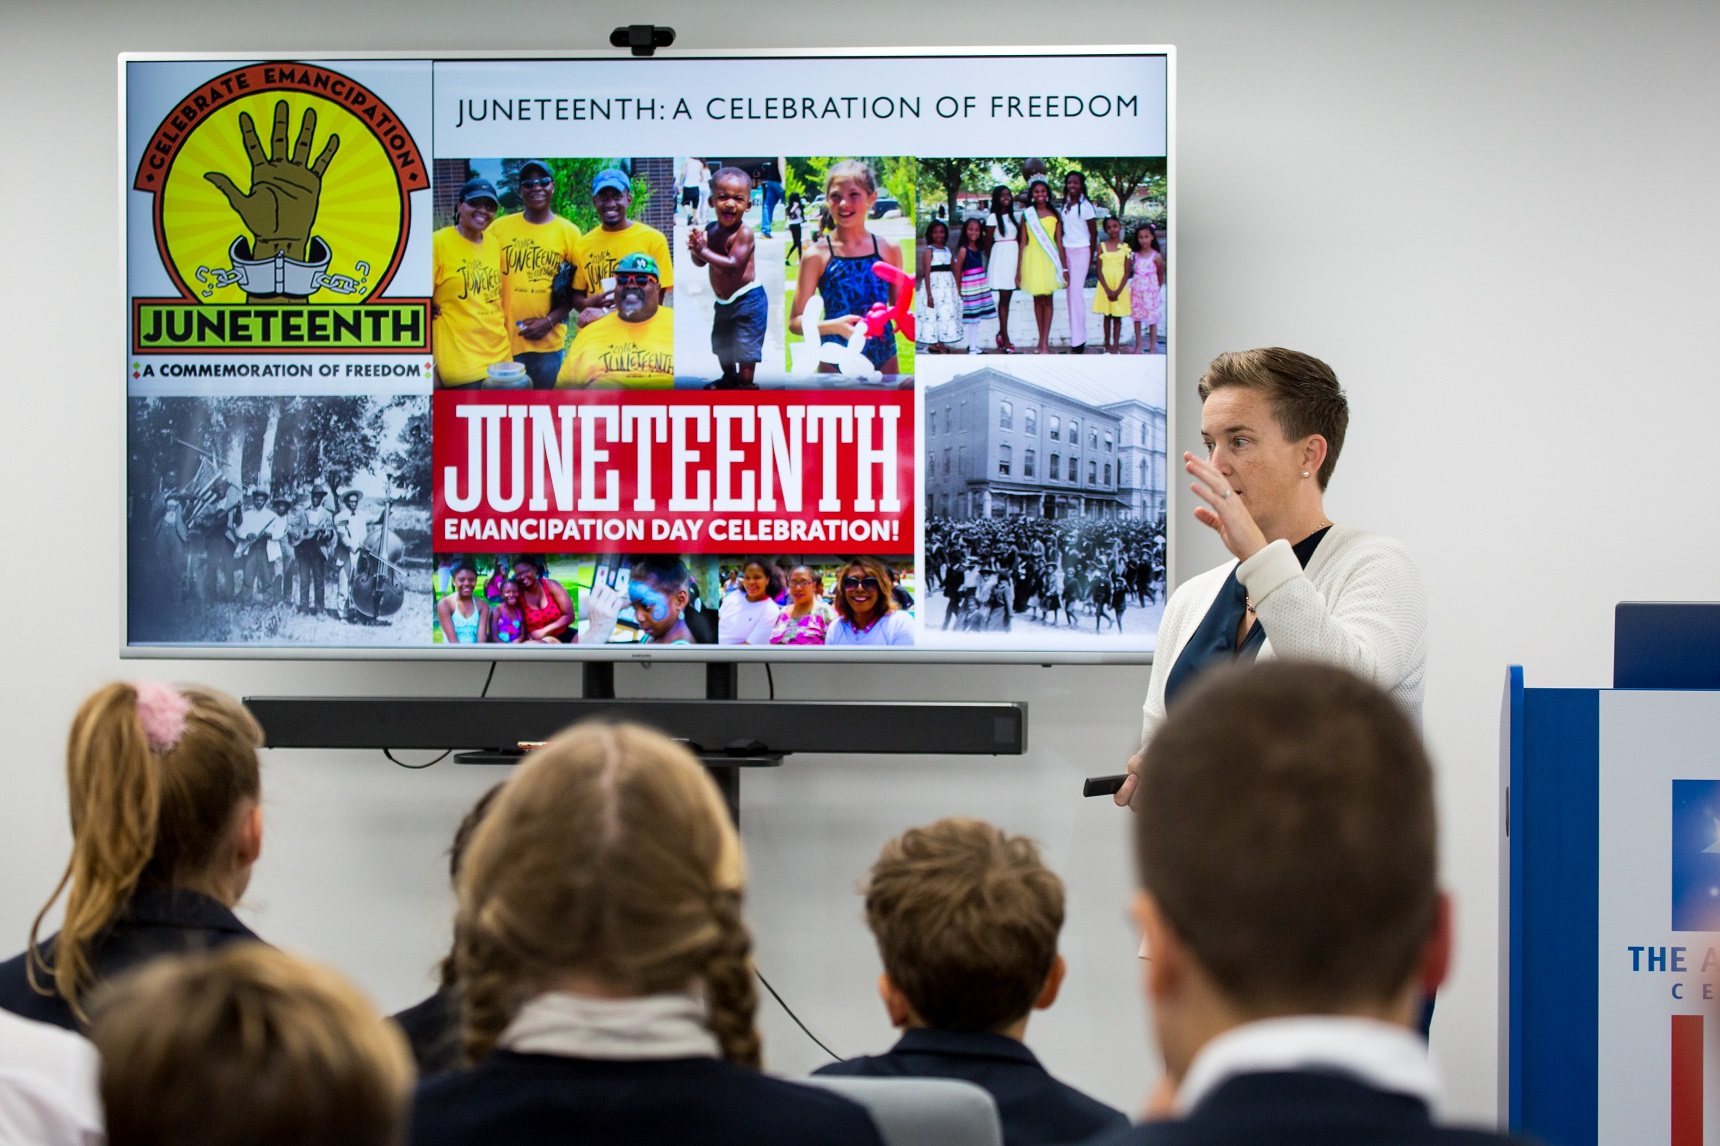 2019 09 26 - Meghan's Presentation @ American Center-11